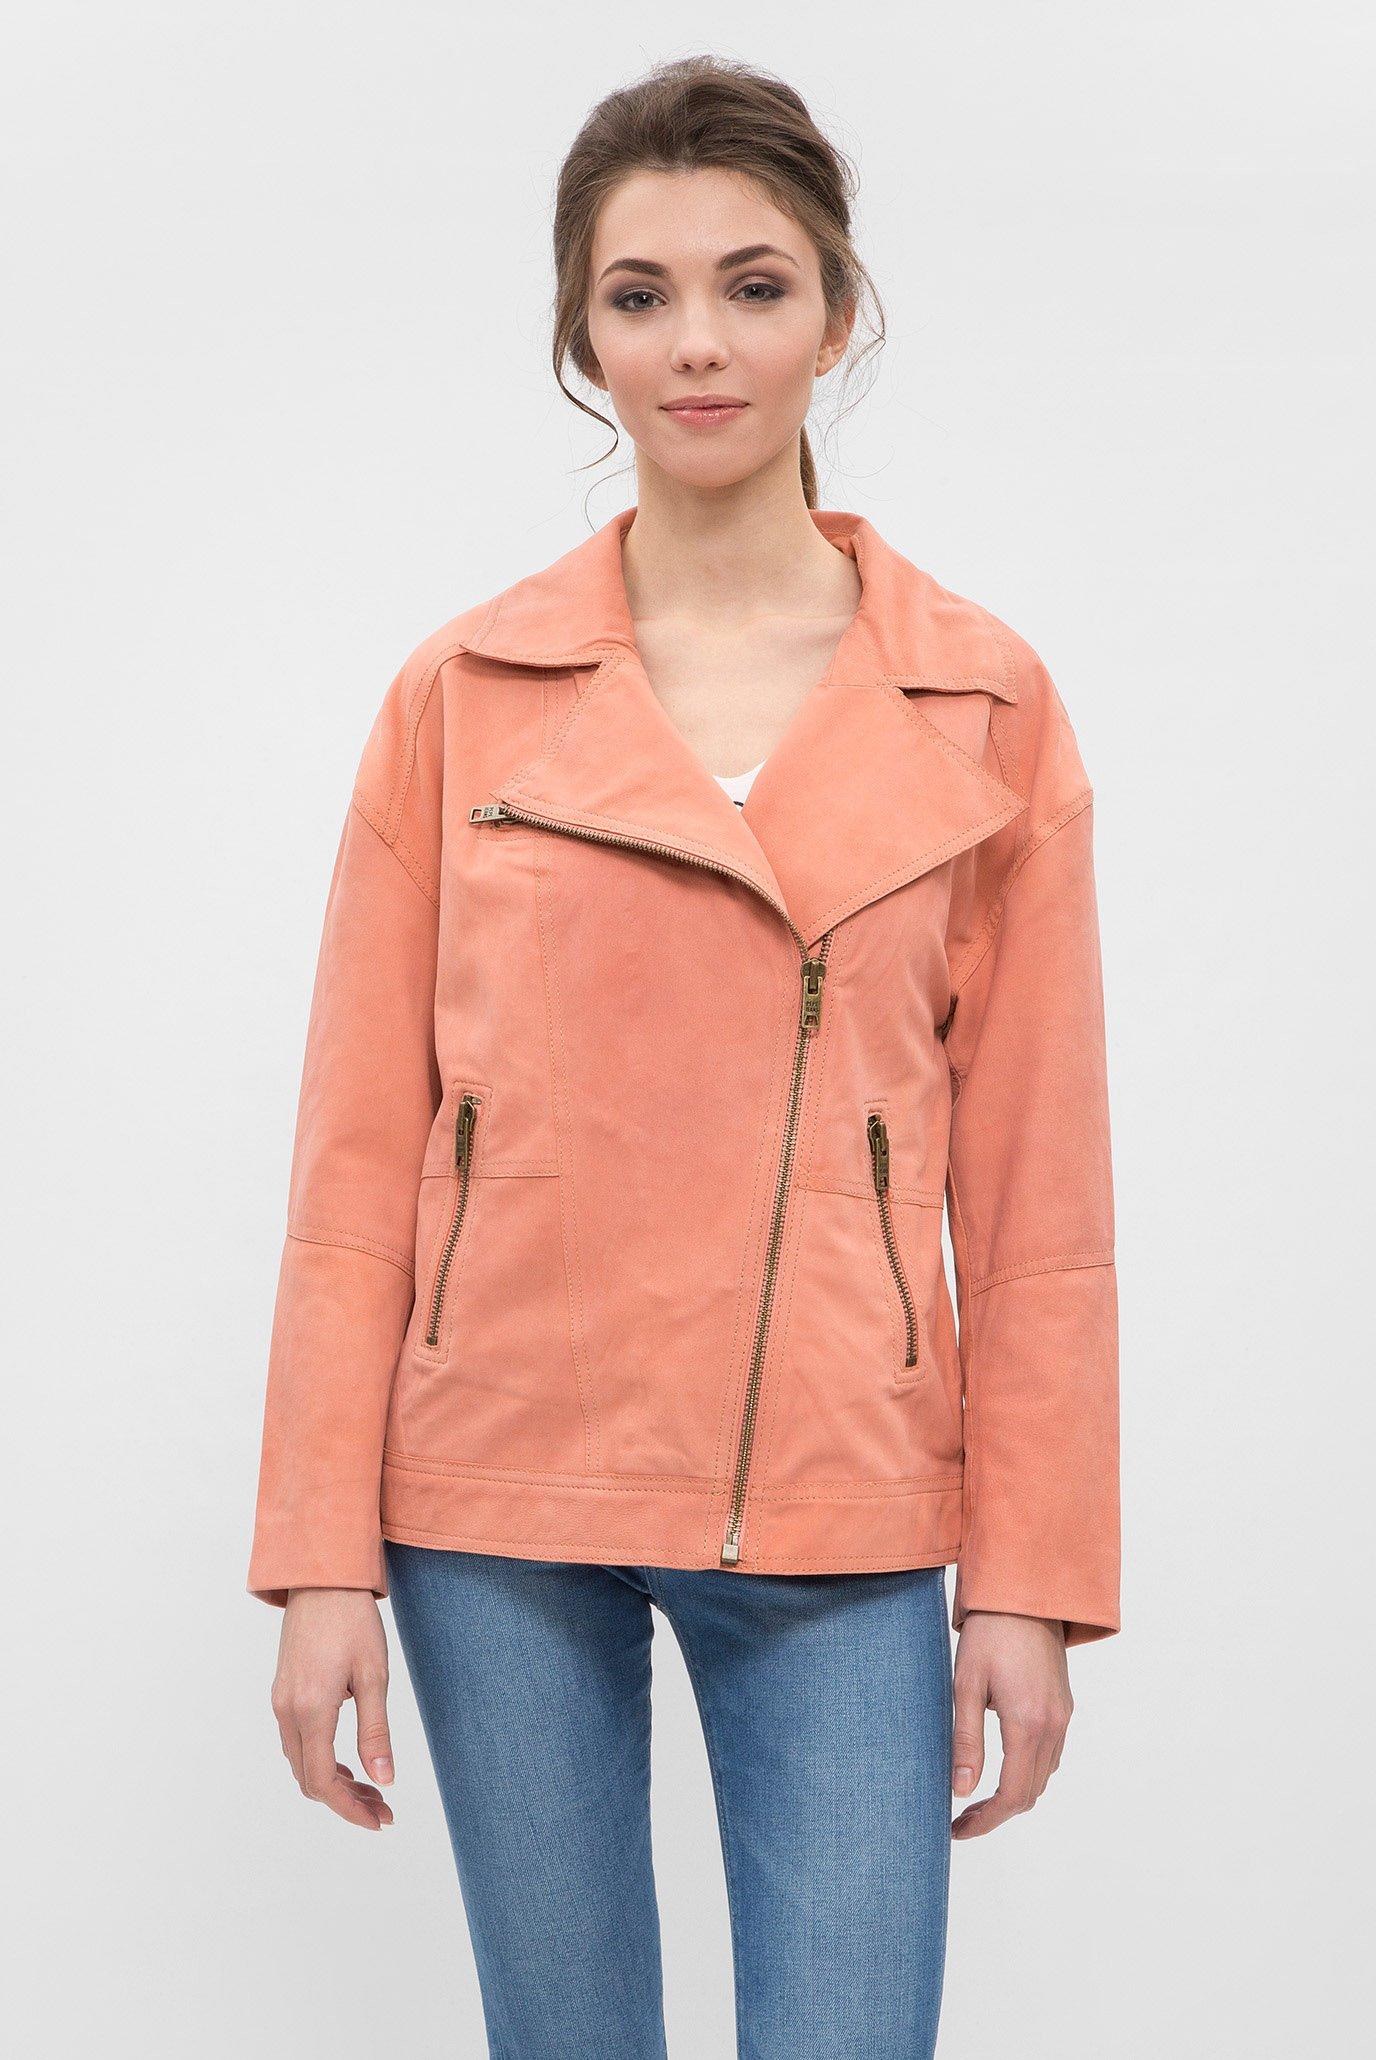 Женская розовая кожаная куртка MARA Pepe Jeans